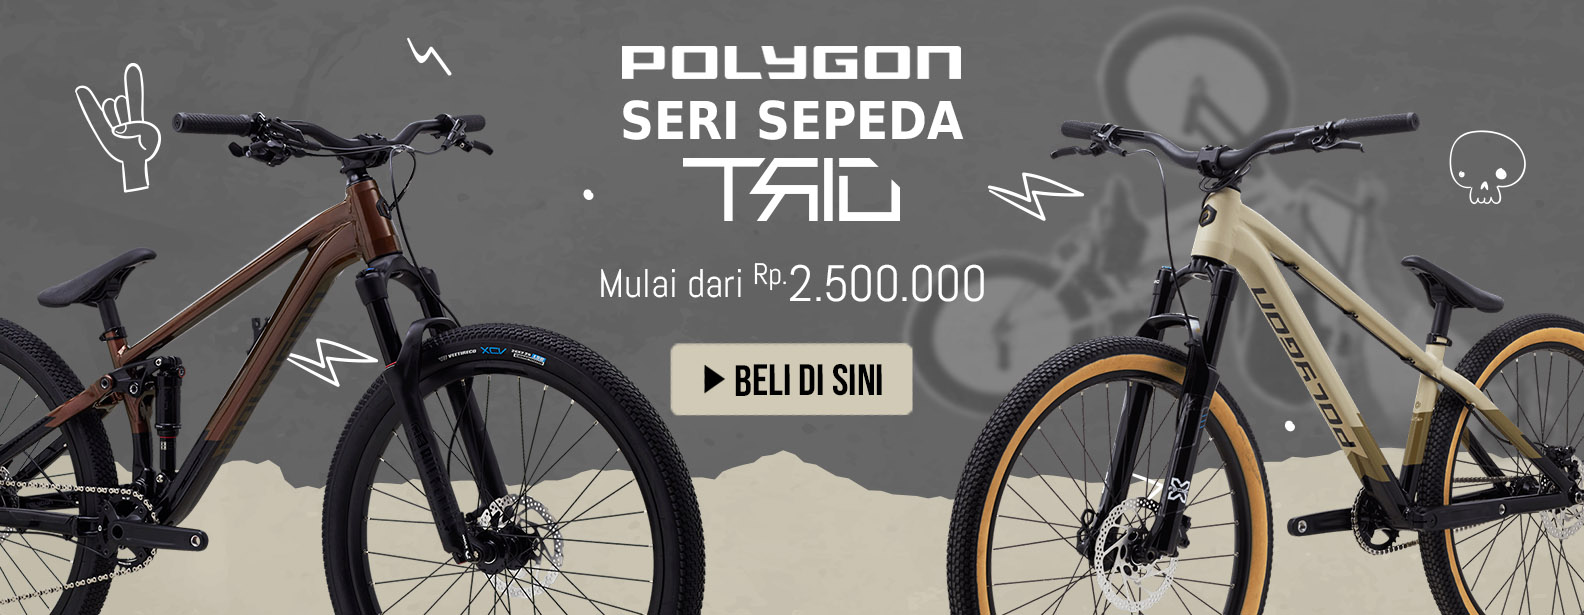 Polygon Seri Sepeda Trid